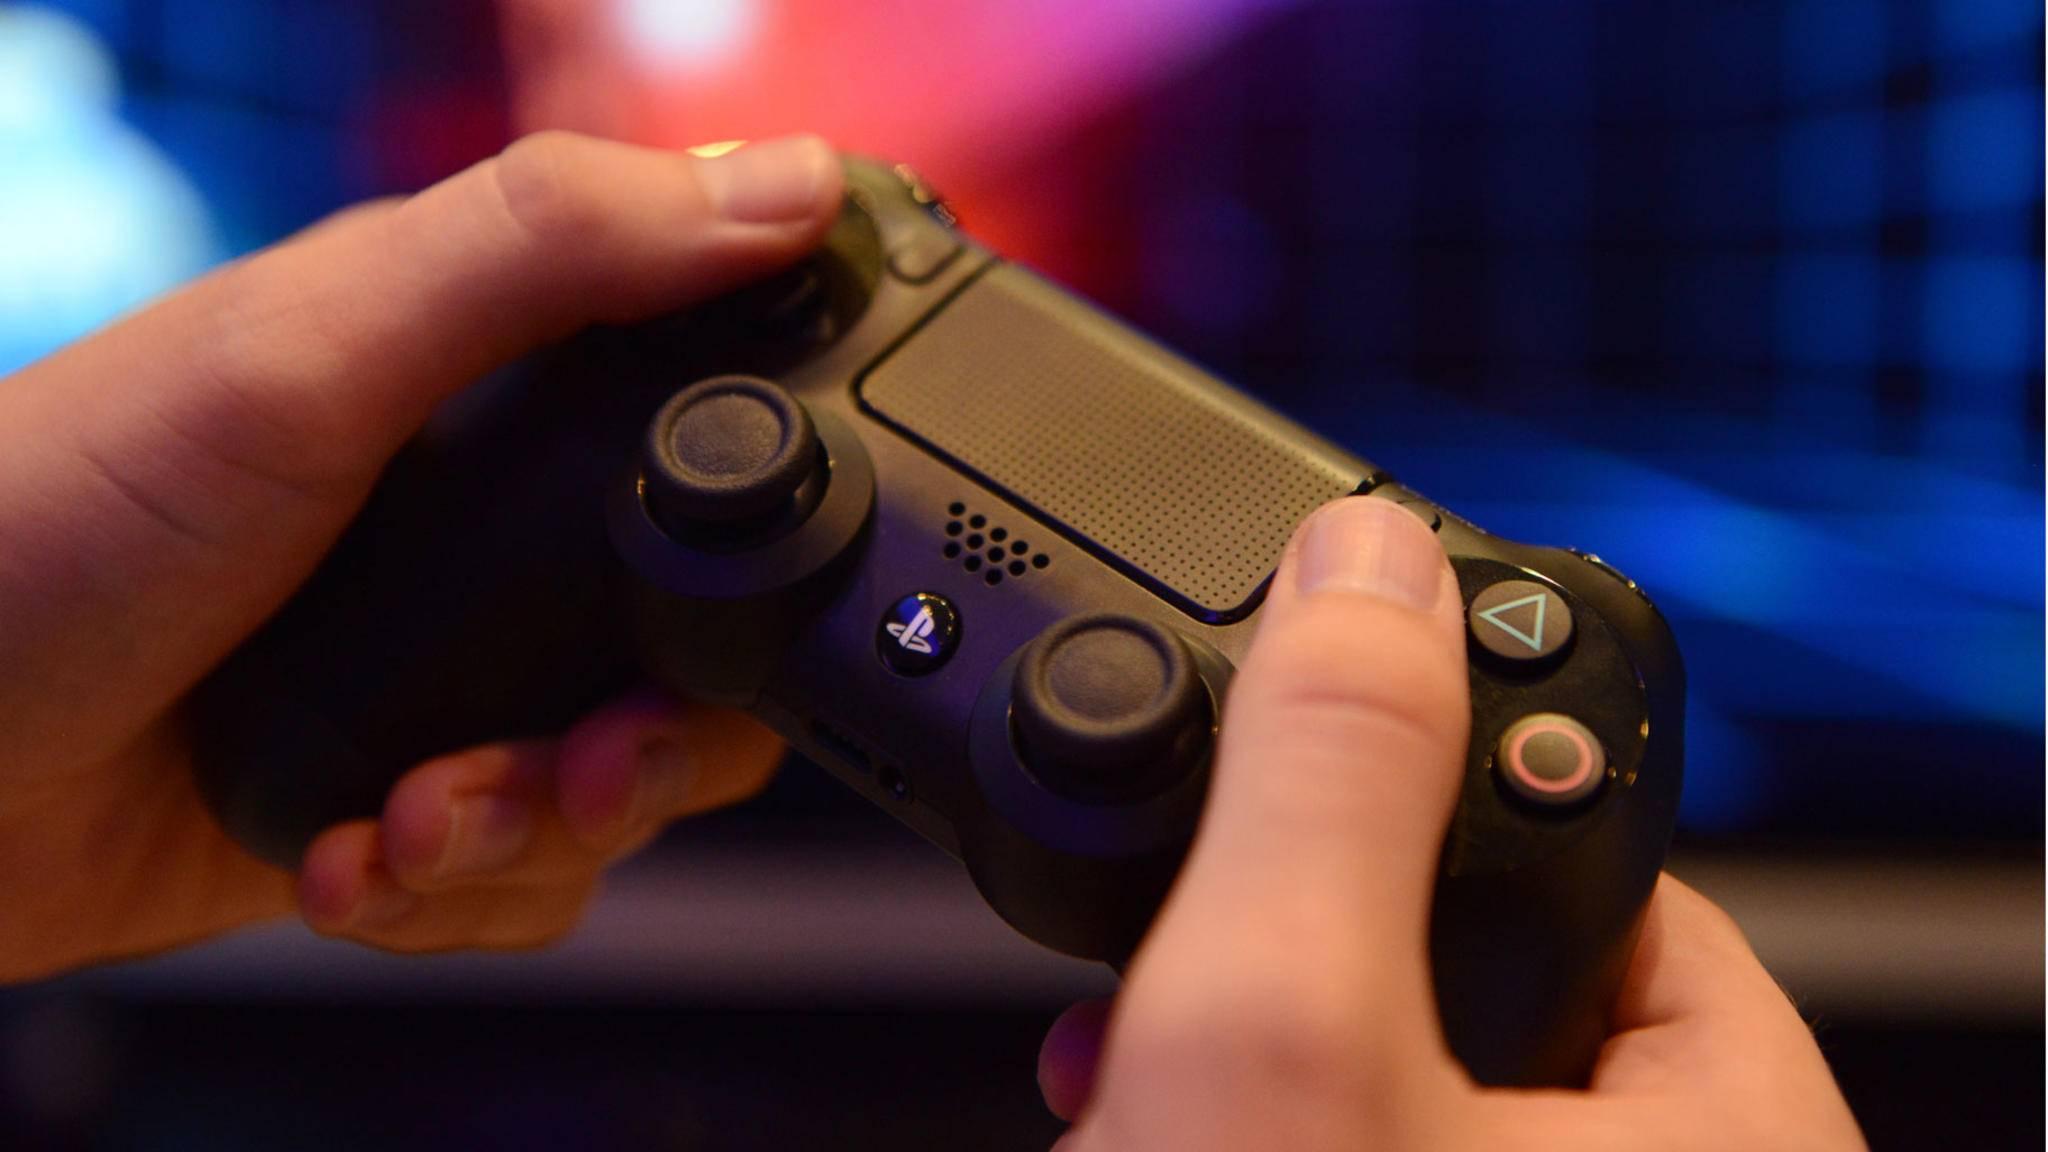 Die PlayStation 4 wurde am 20. Februar 2013 erstmalig angekündigt.